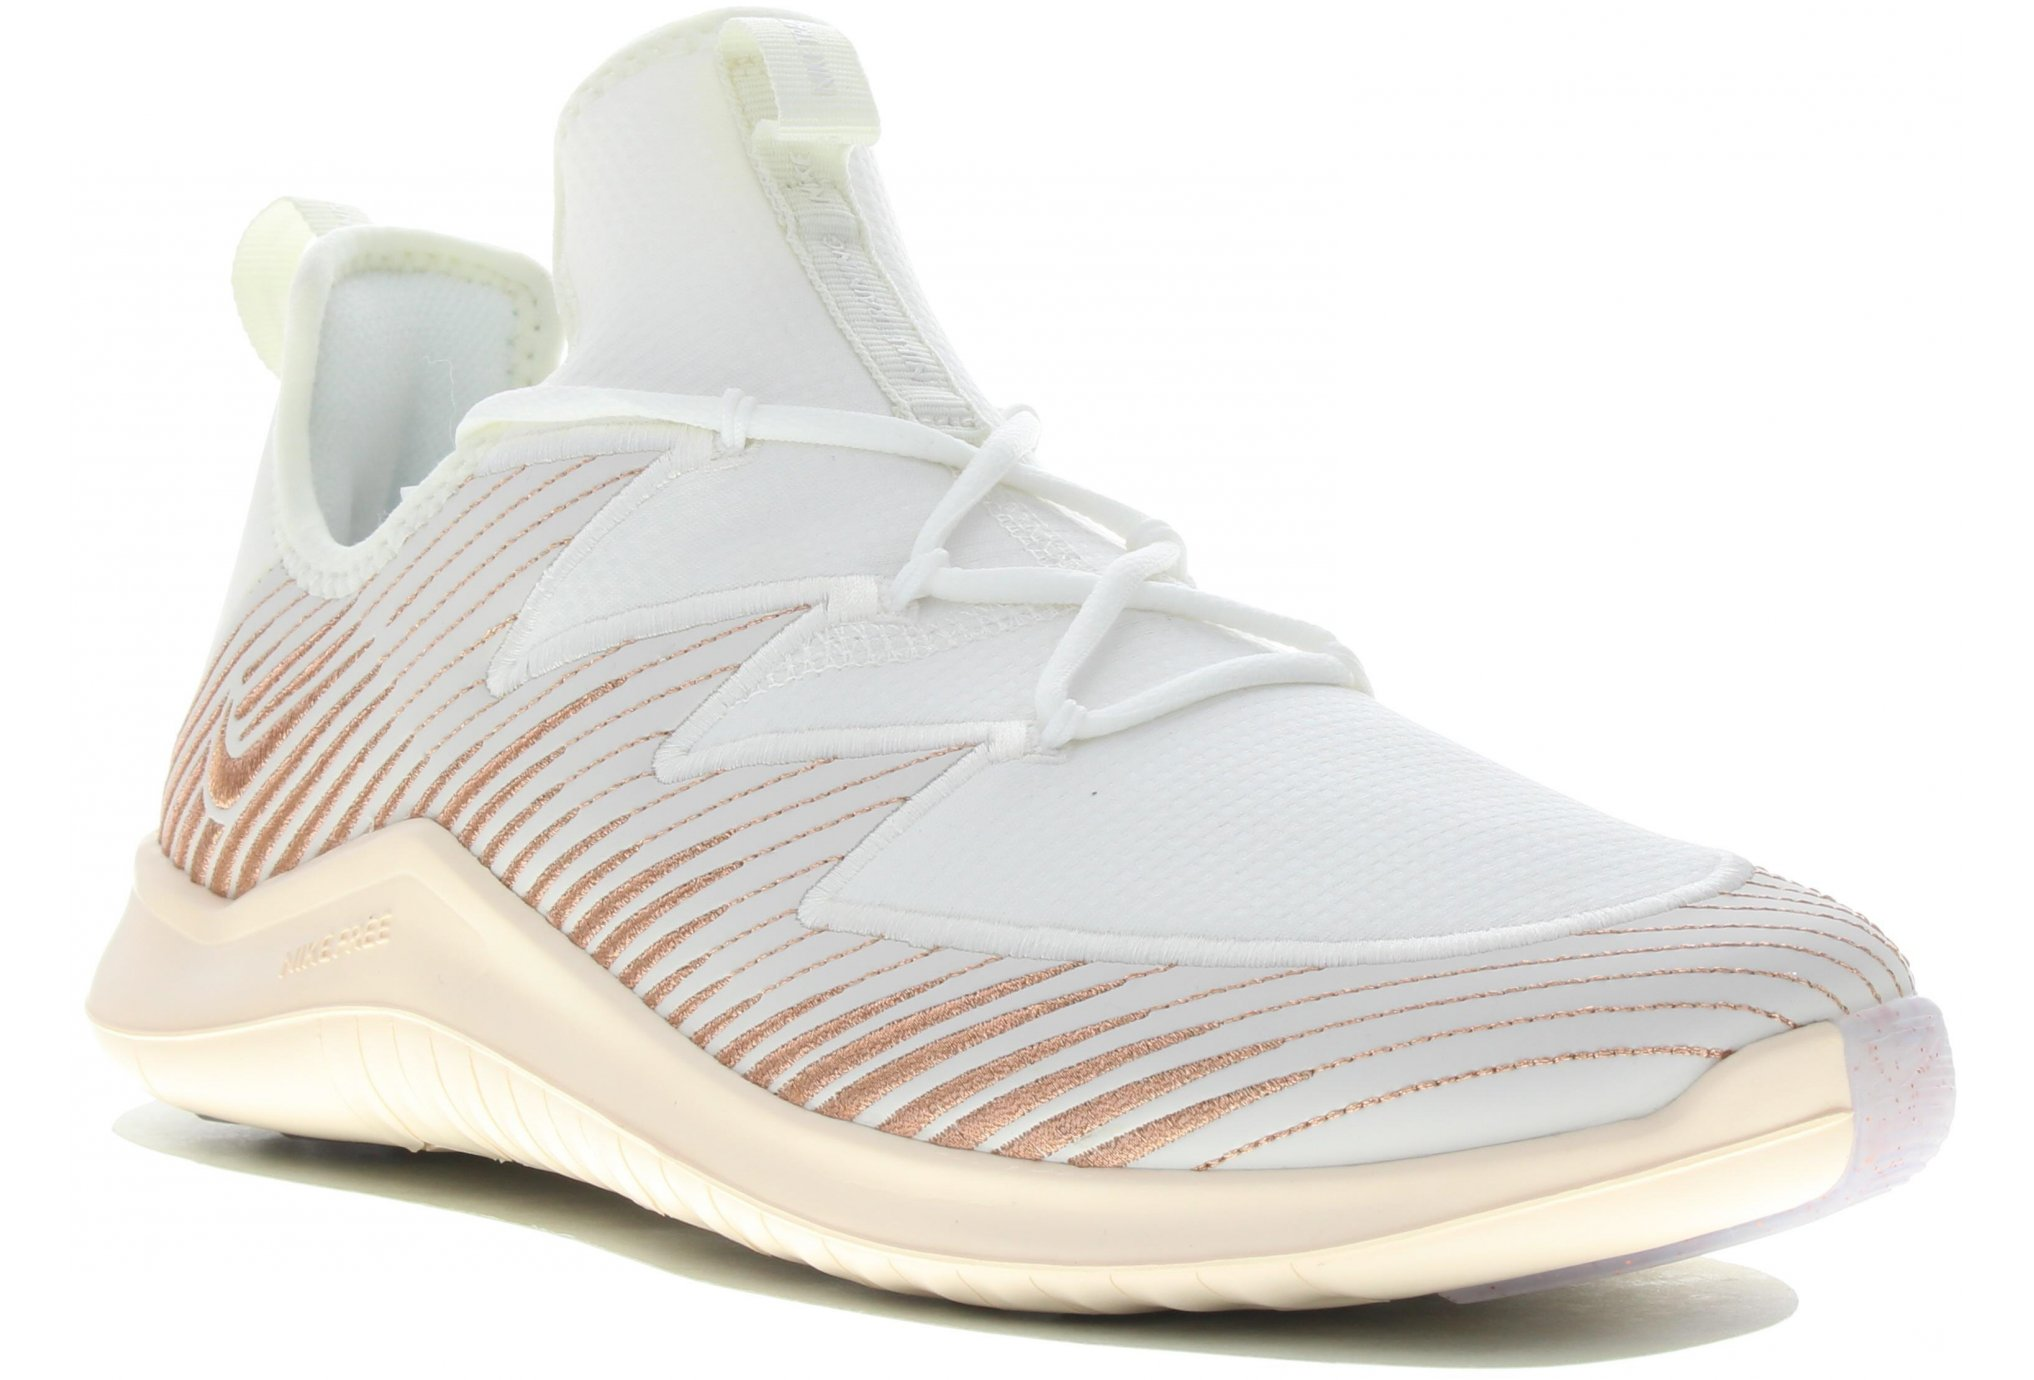 Nike Free TR Ultra Metallic W Diététique Chaussures femme